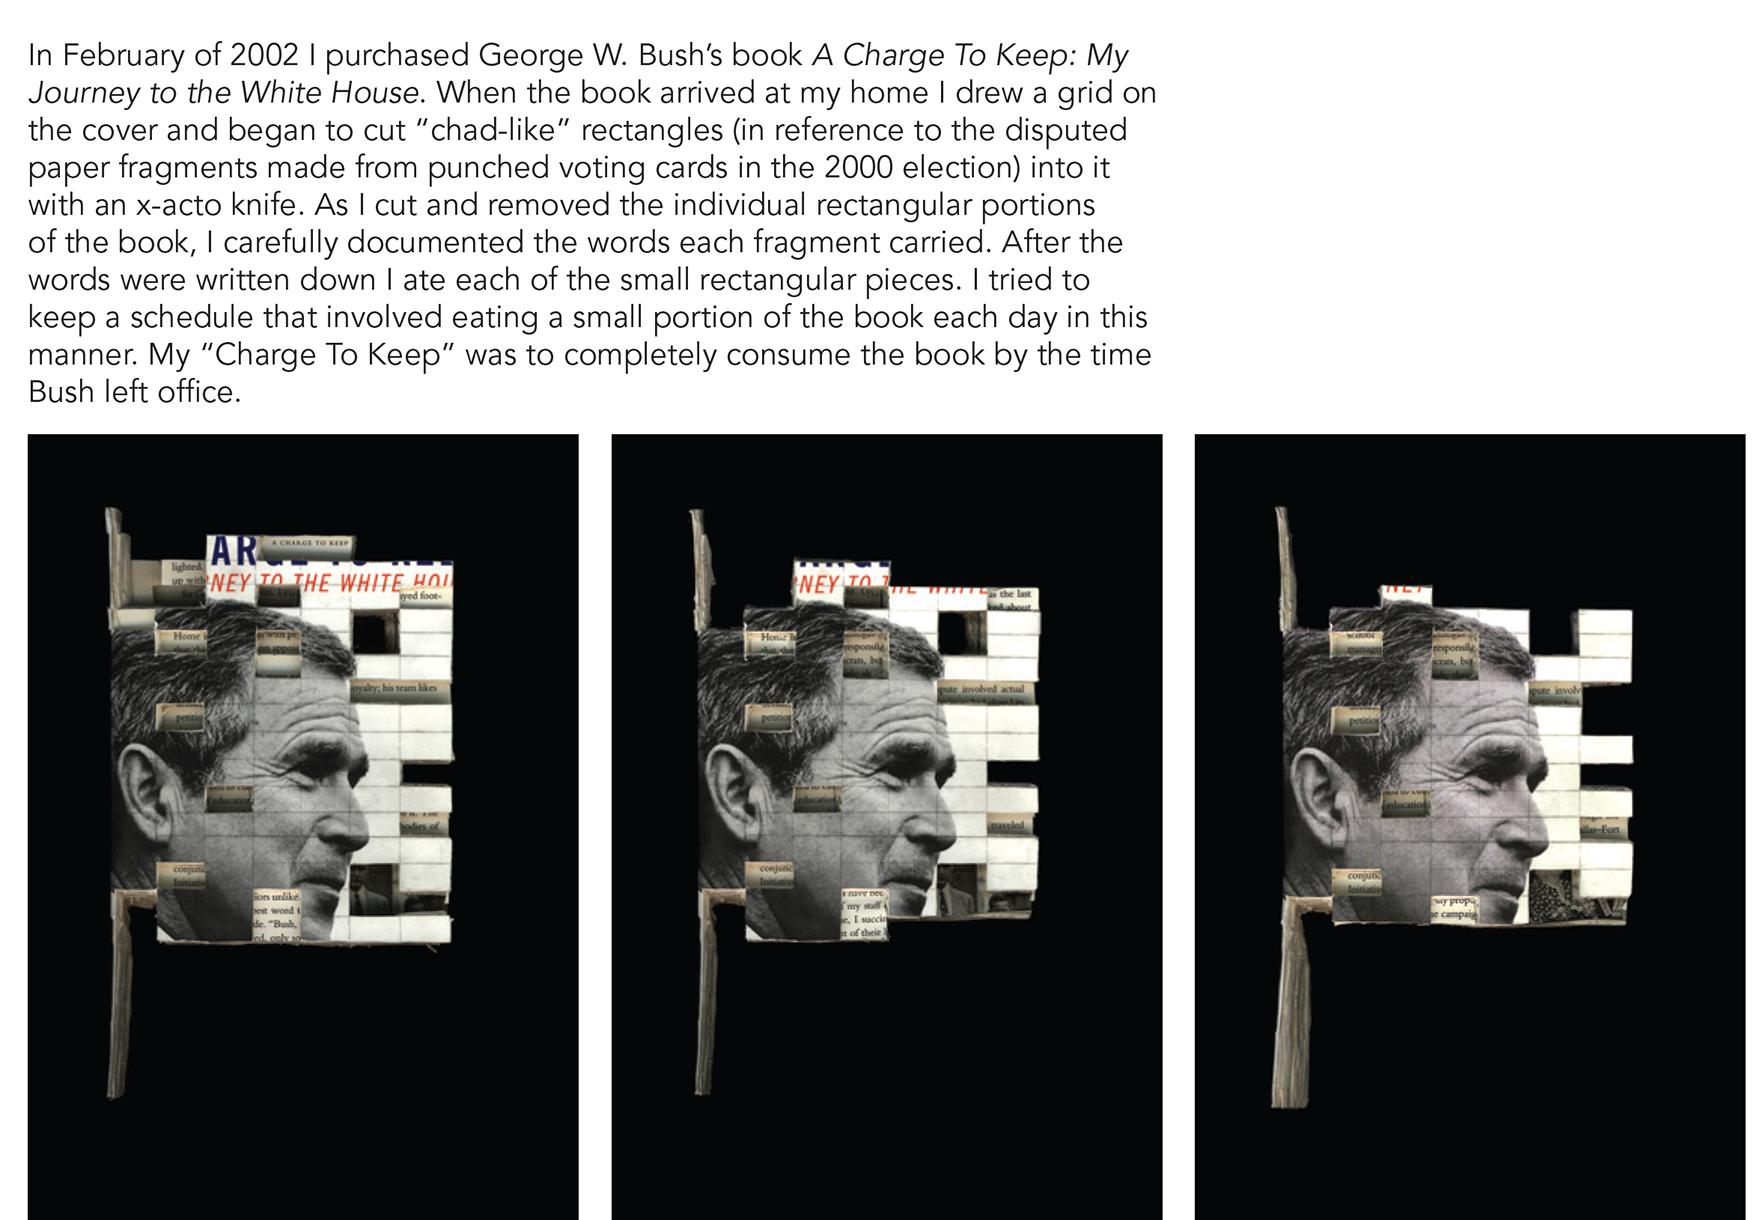 Sean_miller_Bush_book_3.jpg